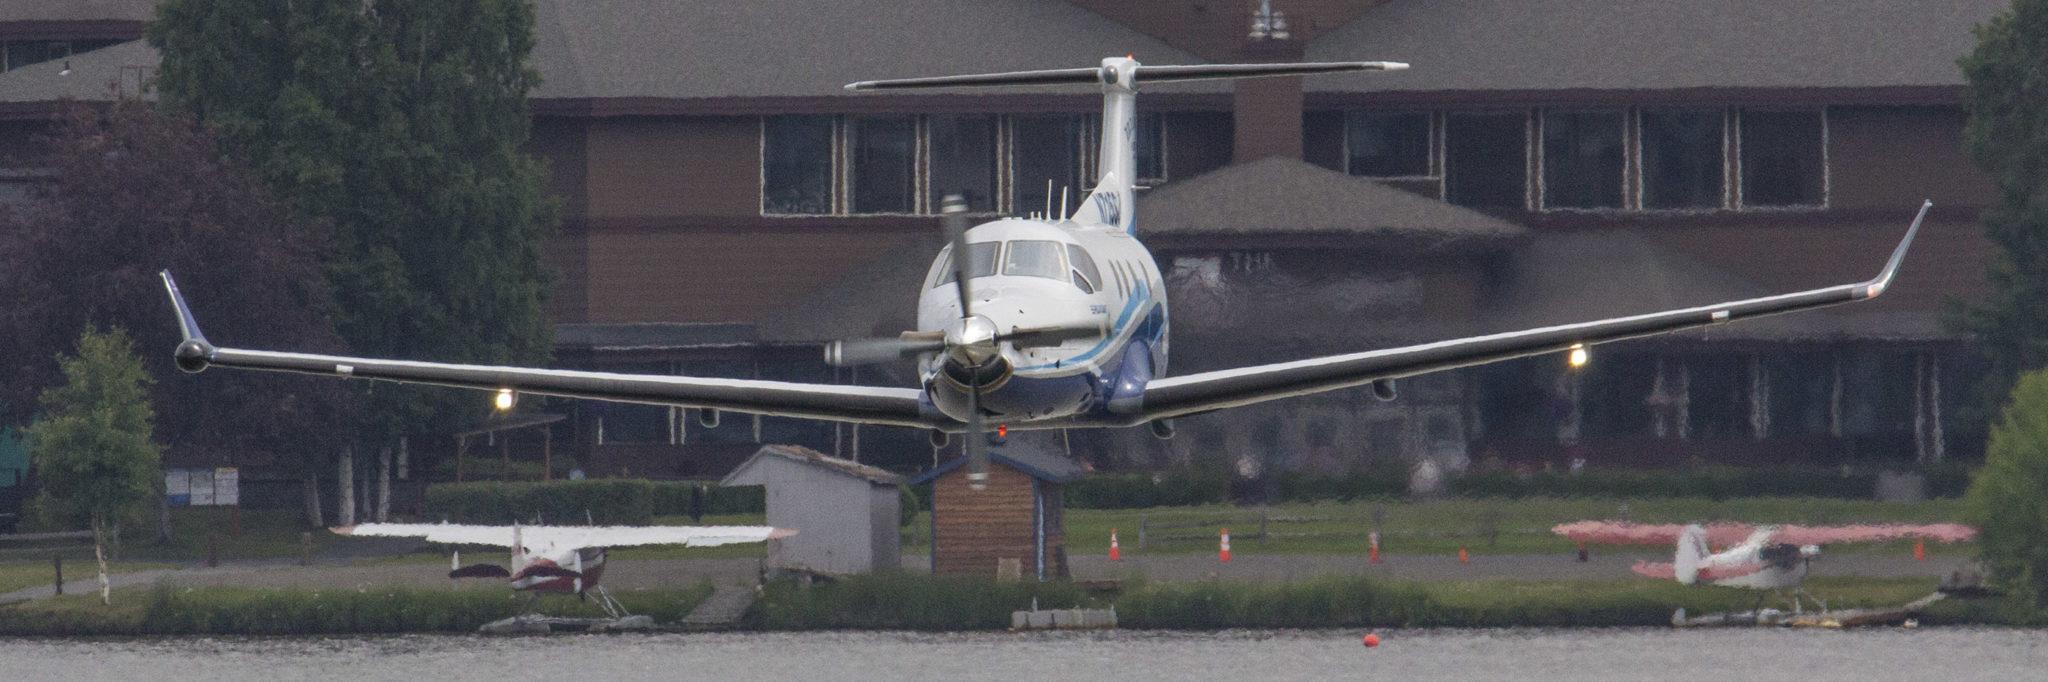 Alaskafoto aircraft image